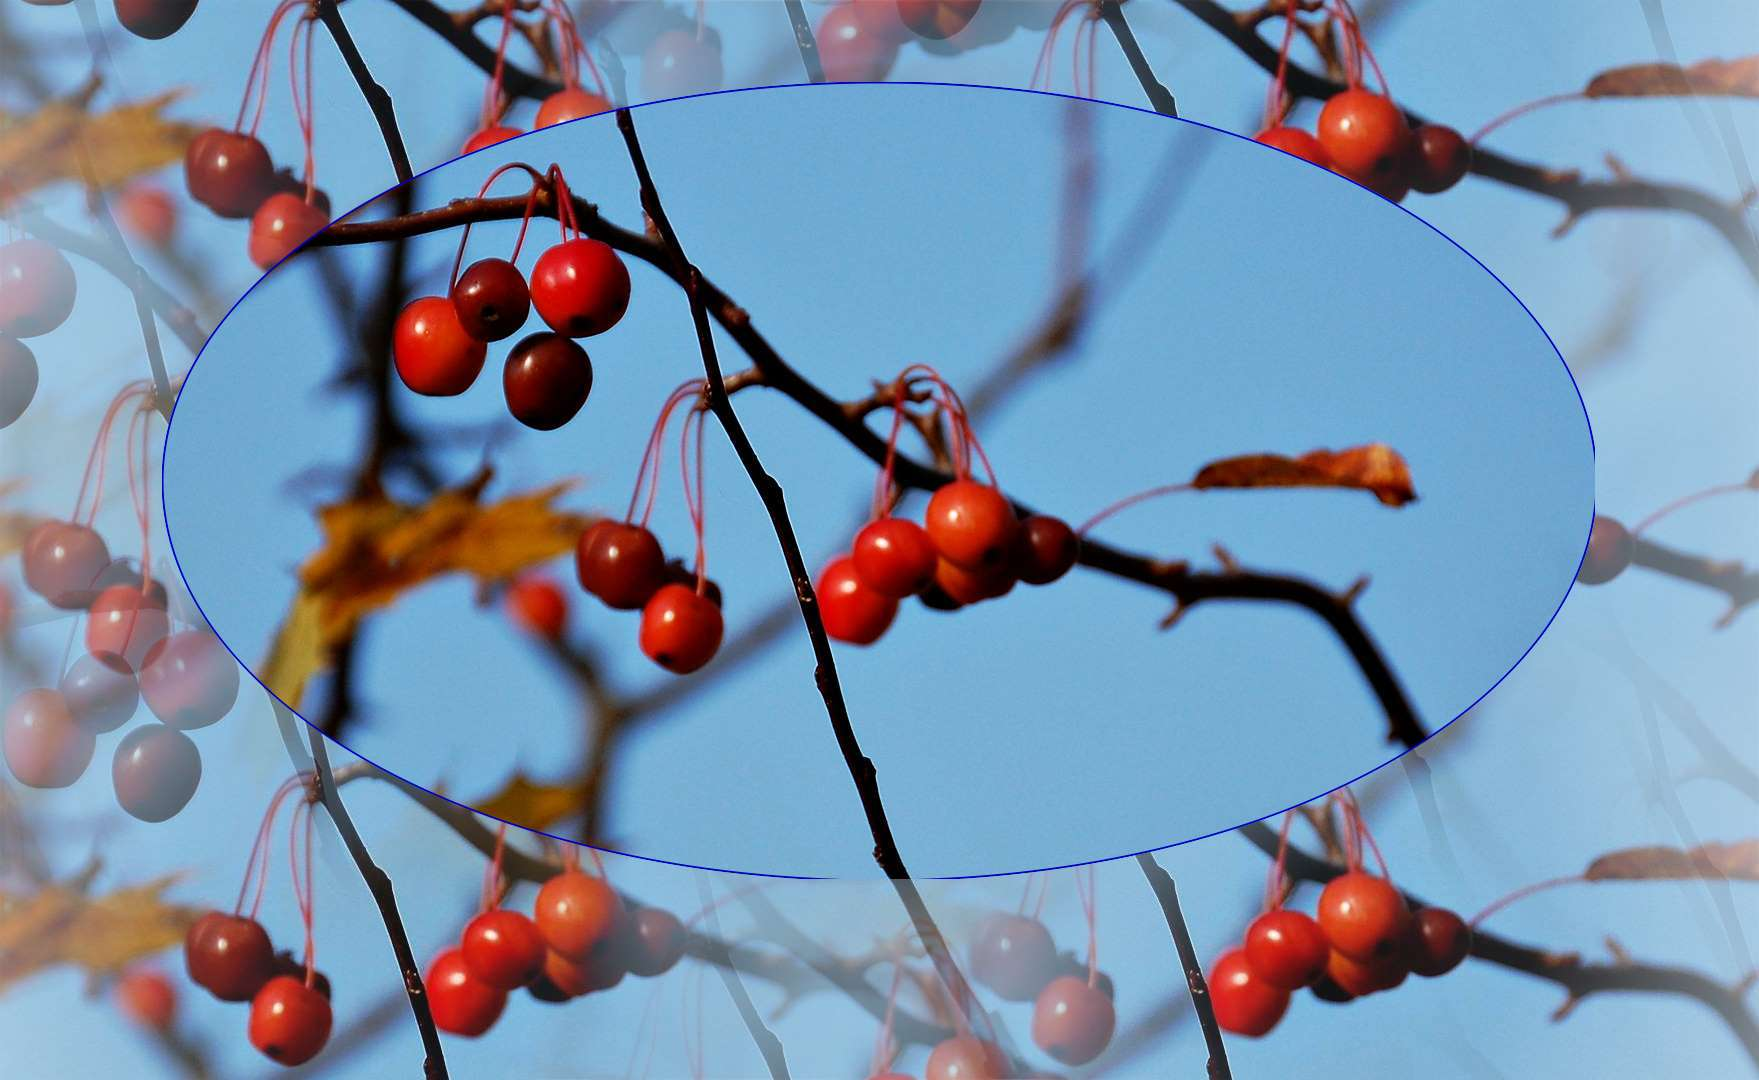 Spielerei mit roten Beeren